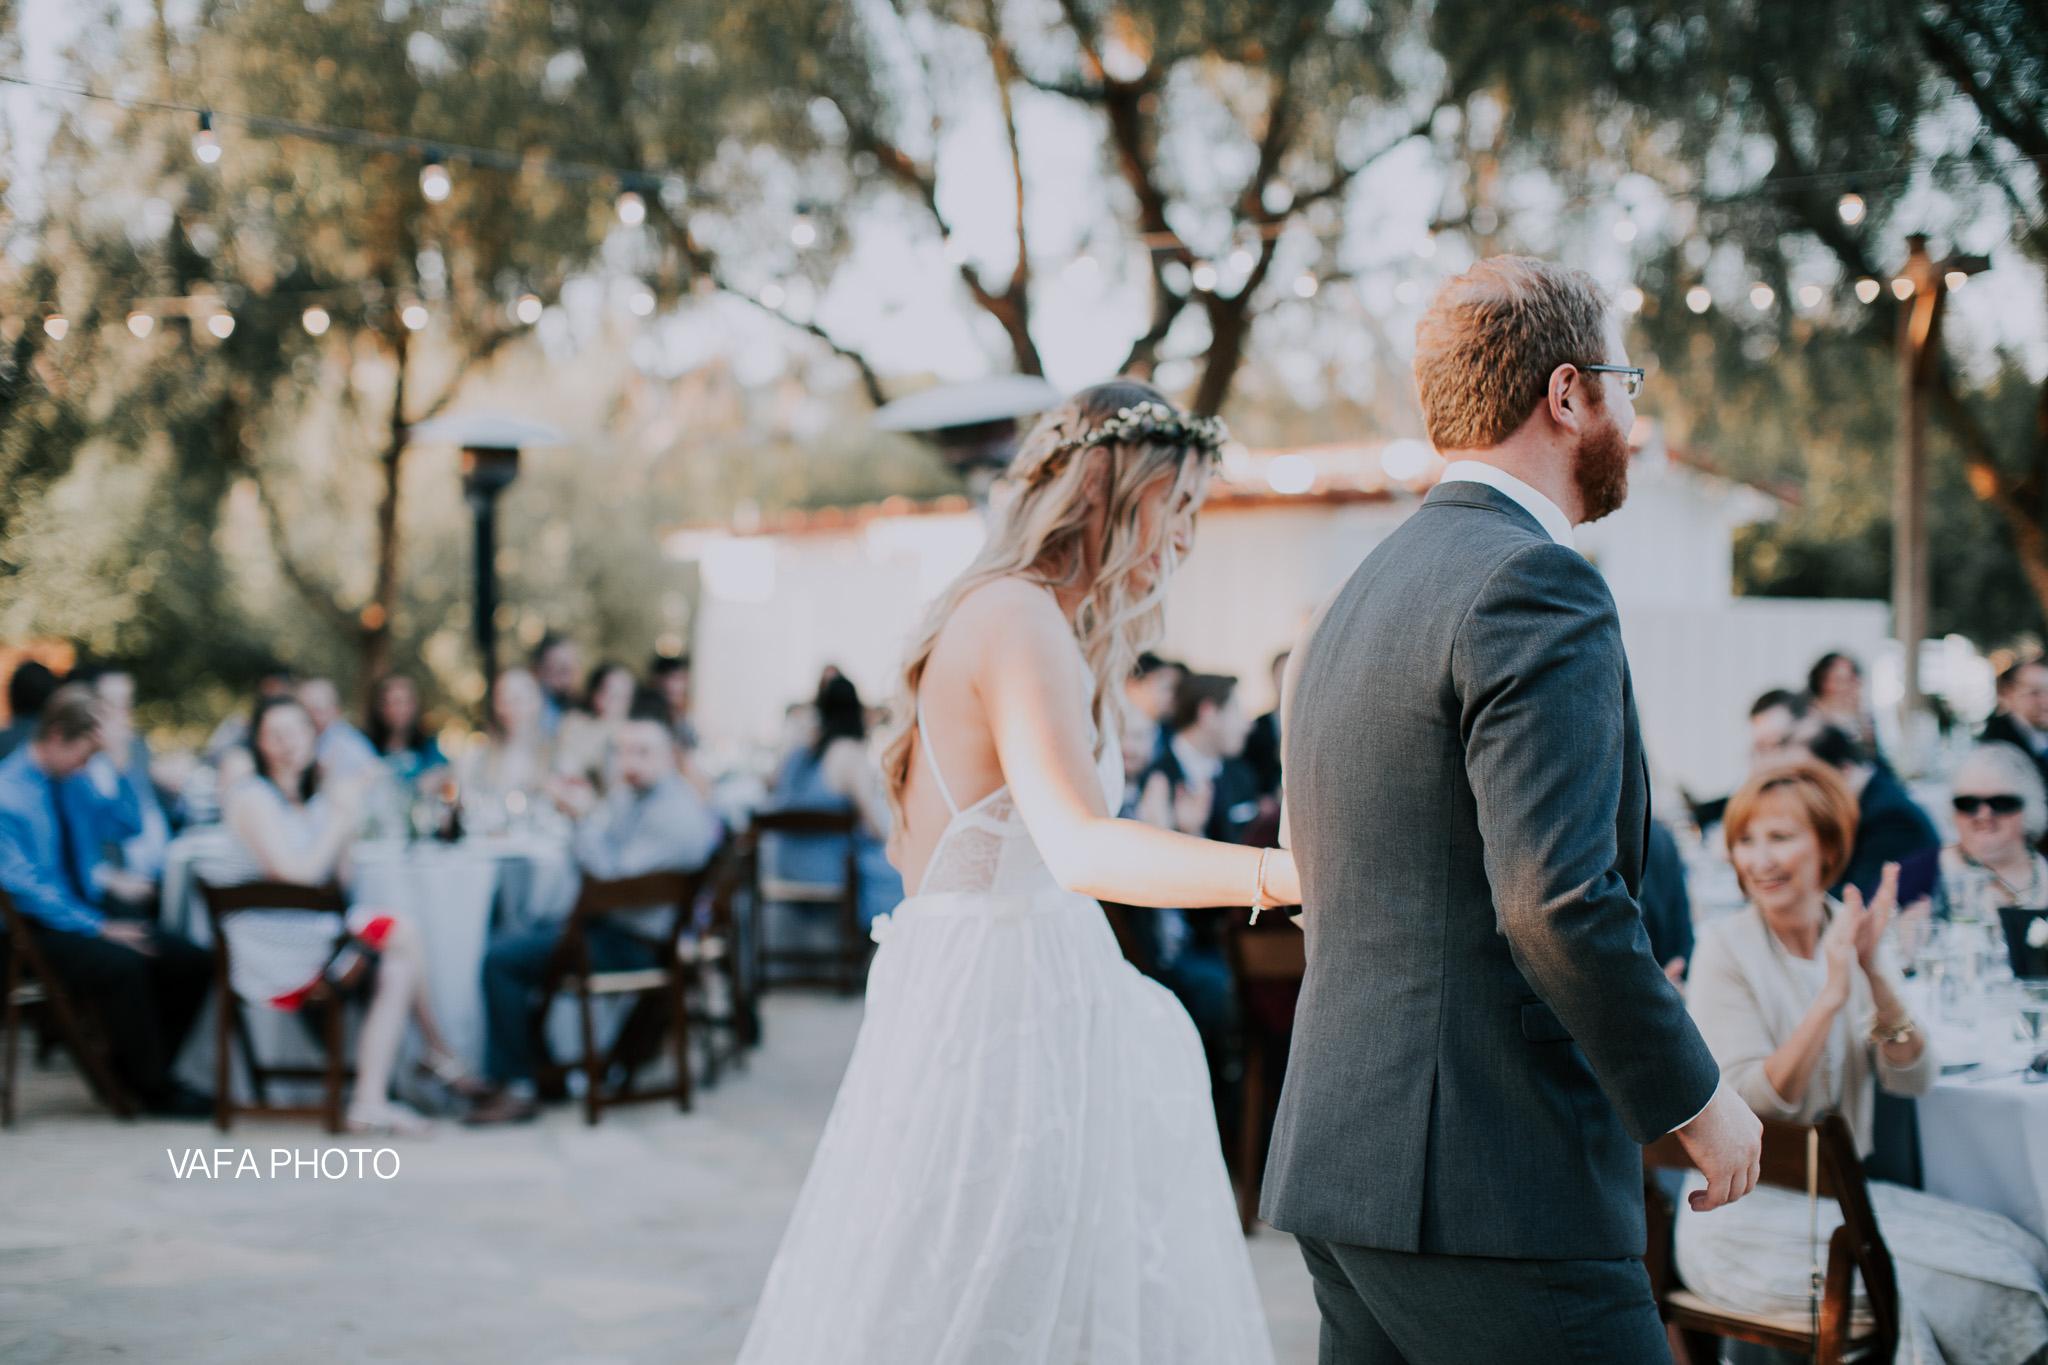 Leo-Carrillo-Ranch-Wedding-Lauren-Mike-Vafa-Photo-951.jpg